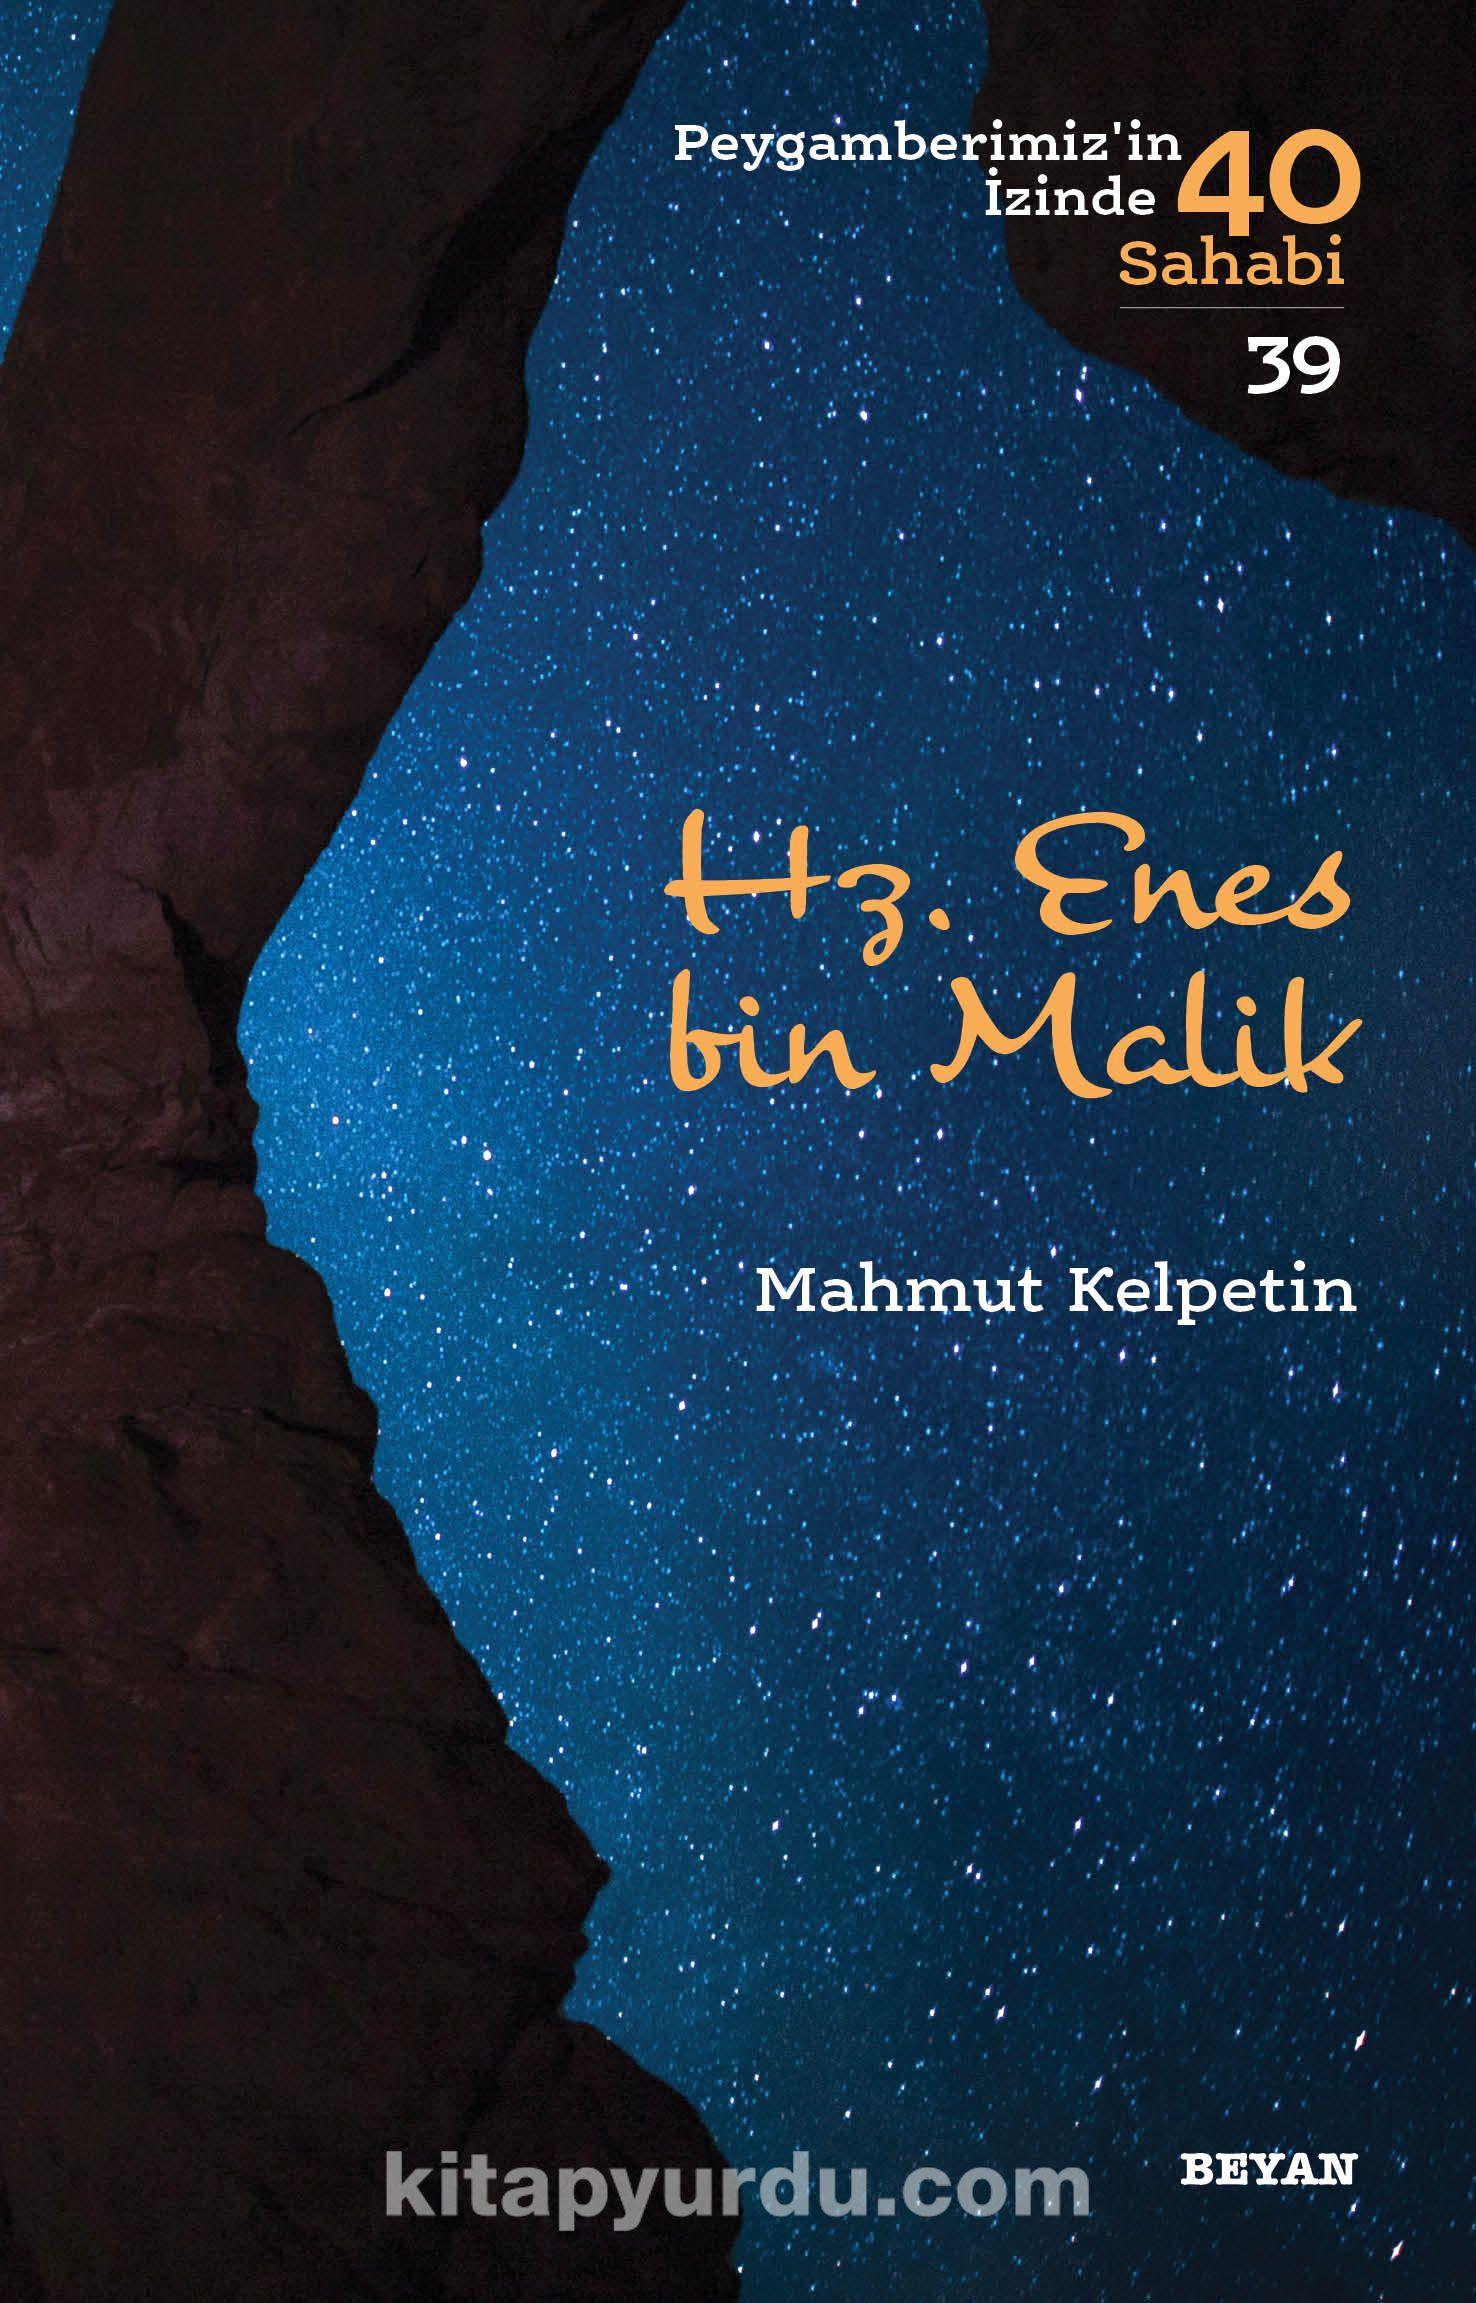 Hz. Enes bin Malik (Peygamberimiz'in İzinde 40 Sahabi 39) - Dr. Mahmut Kelpetin pdf epub